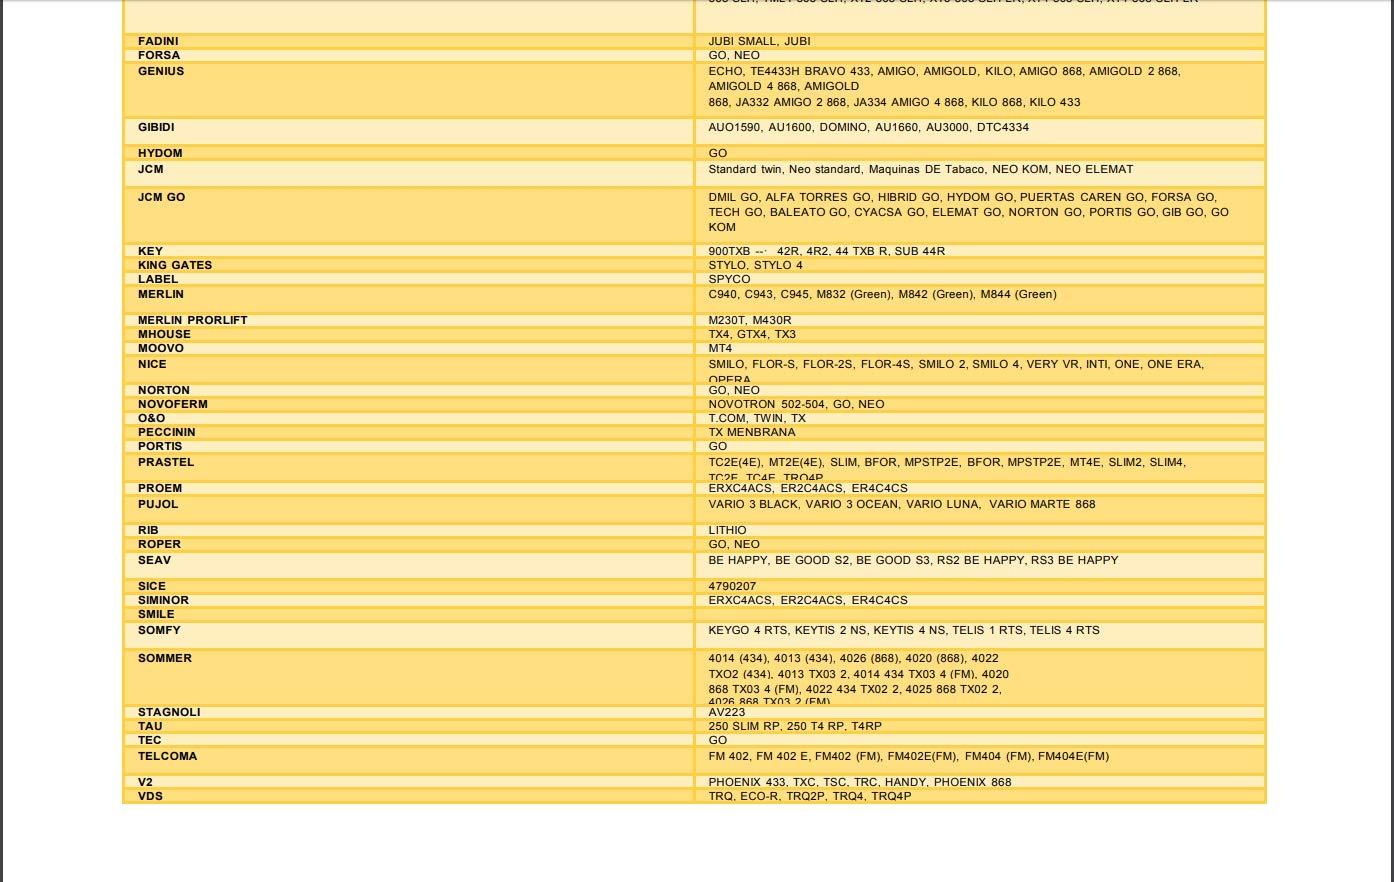 Mando duplicador HR Matic 2 Rolling Code, Compatible Erreka, Pujol, Mutancode, Mastercode, Faac, Clemsa, Forsa, Ditec, Telcoma, JCM, V2, Go, Sommer, ...